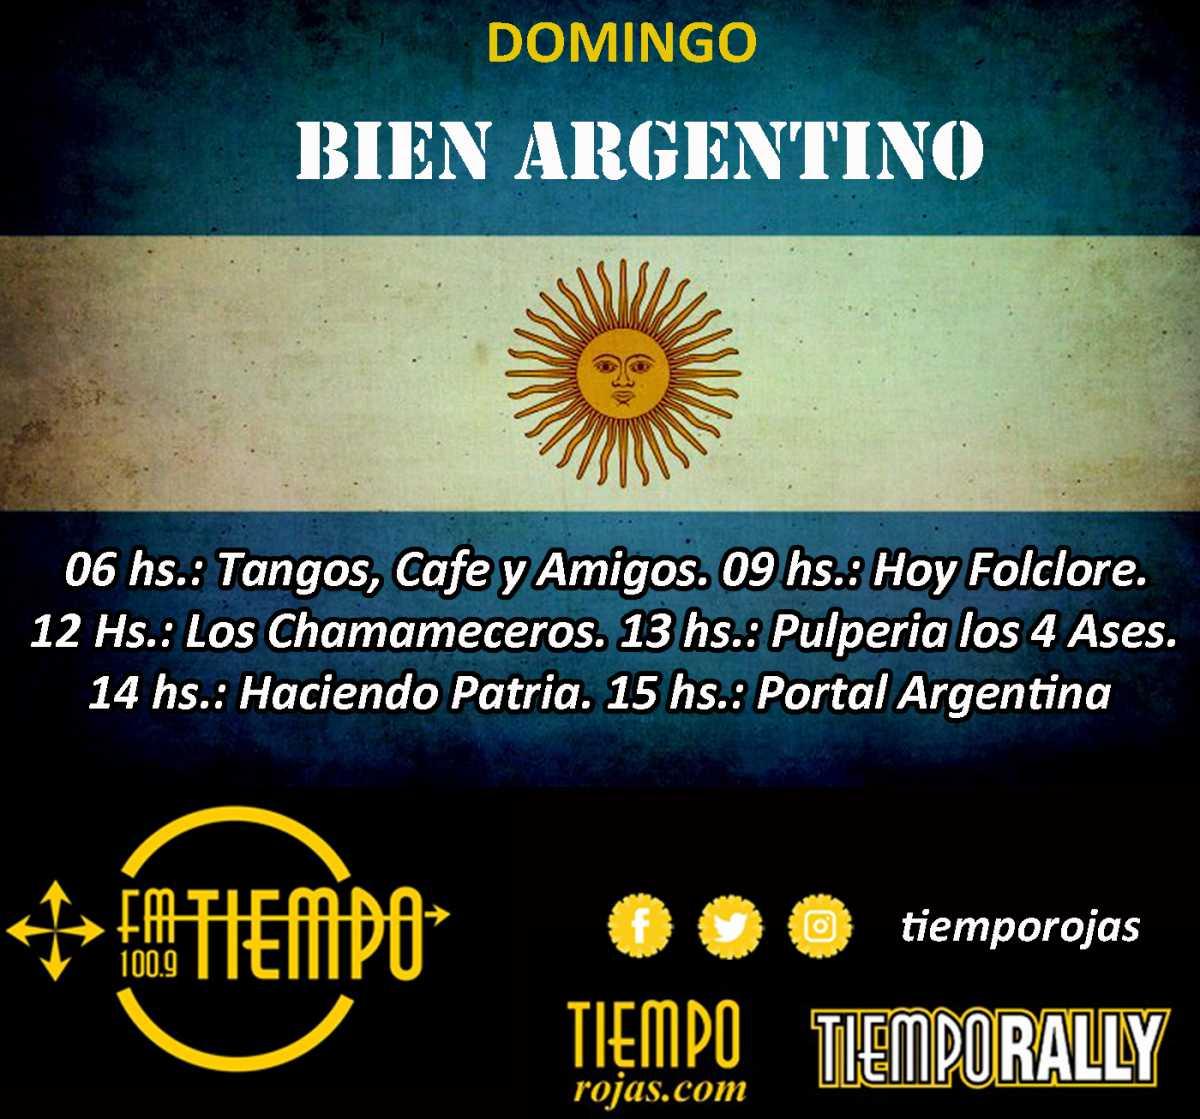 domingo argentino